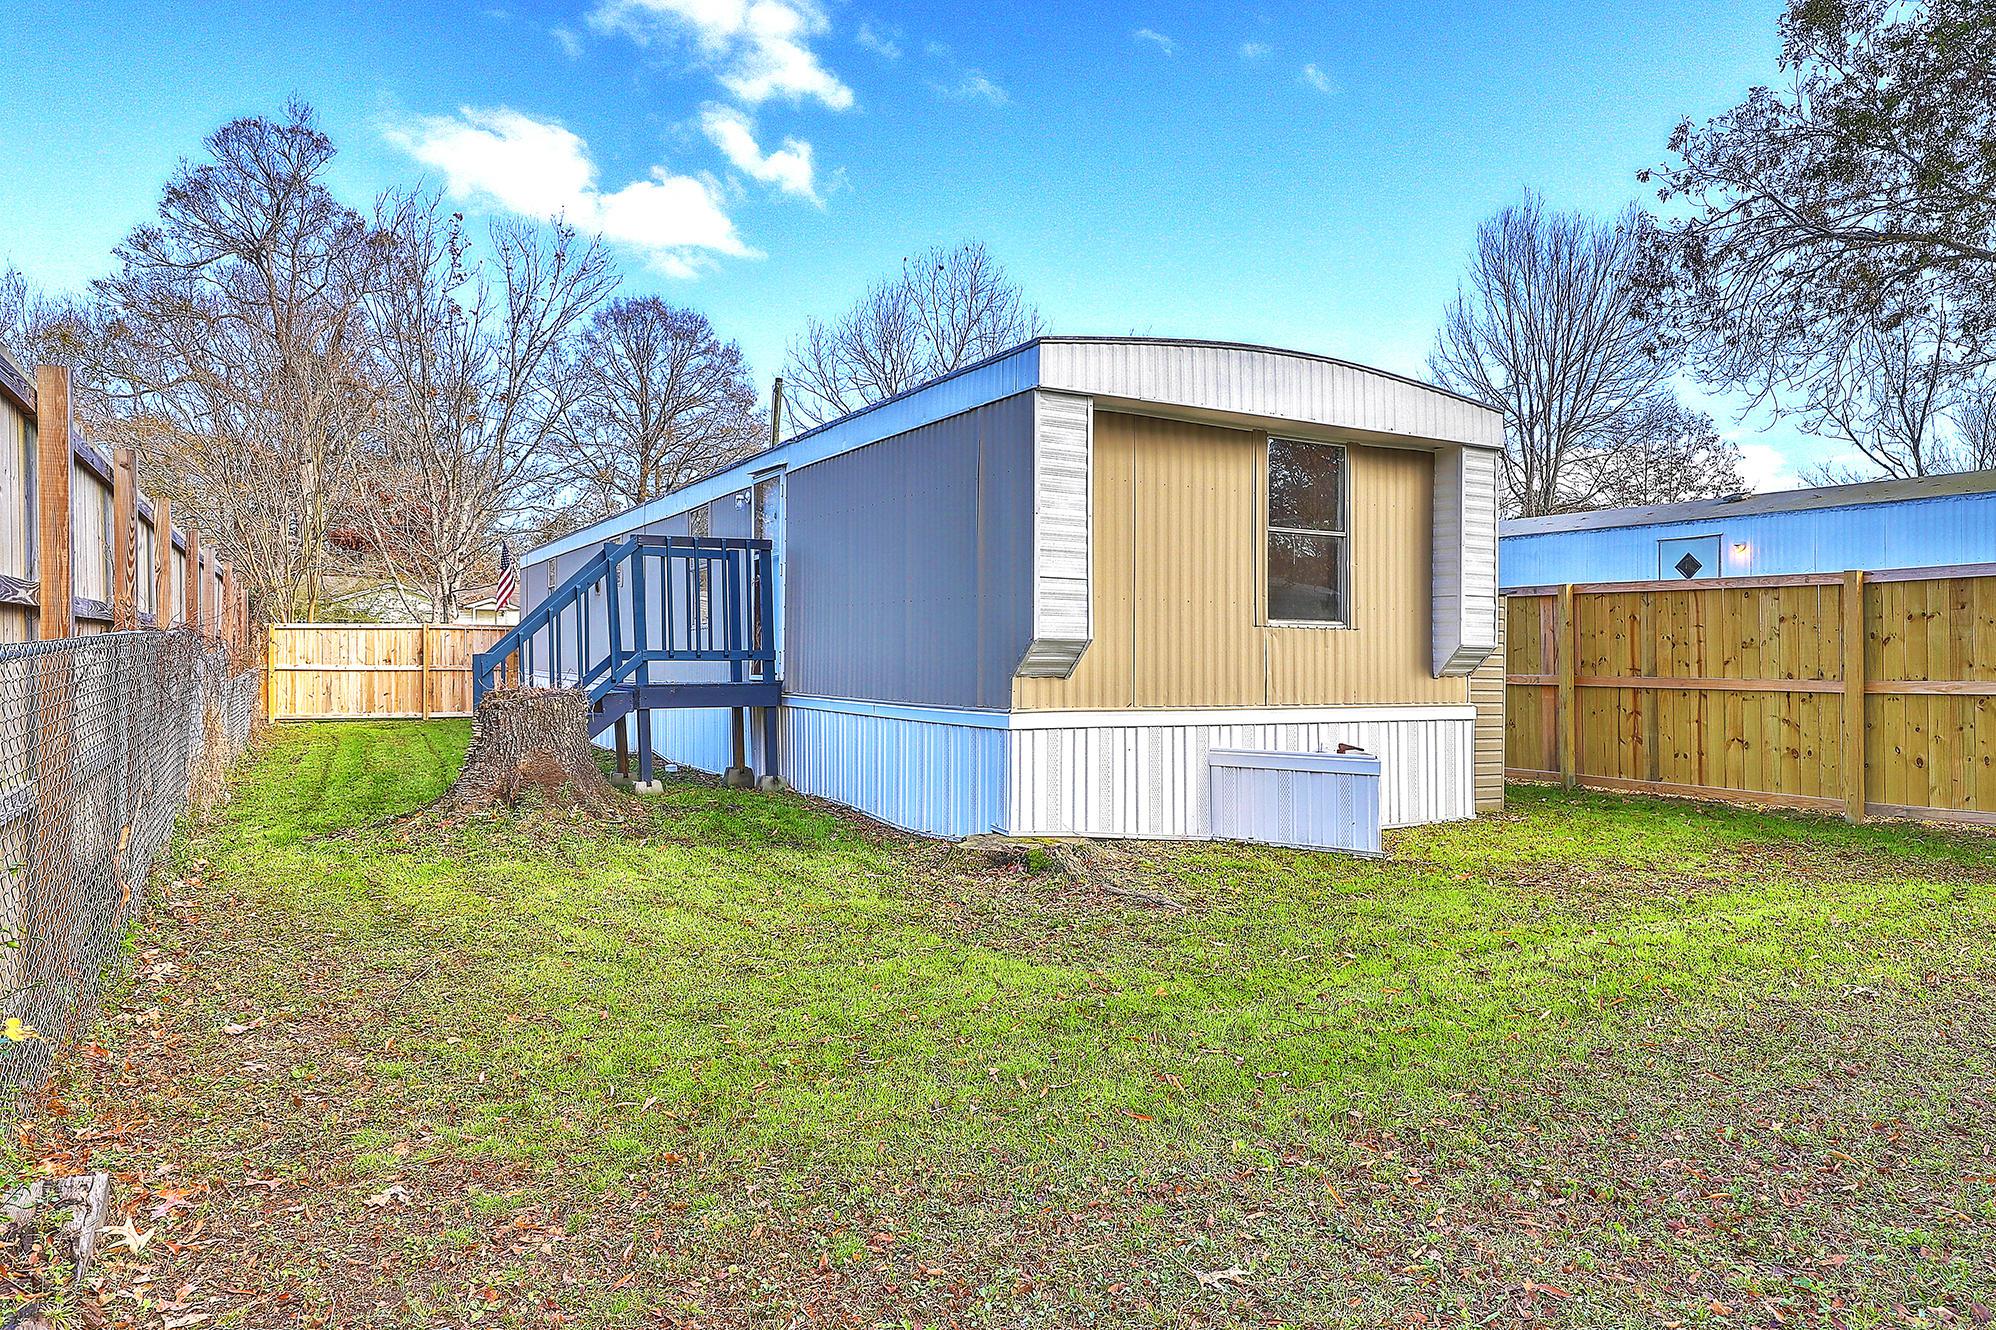 Caromi Village Homes For Sale - 323 Raymond, Ladson, SC - 10